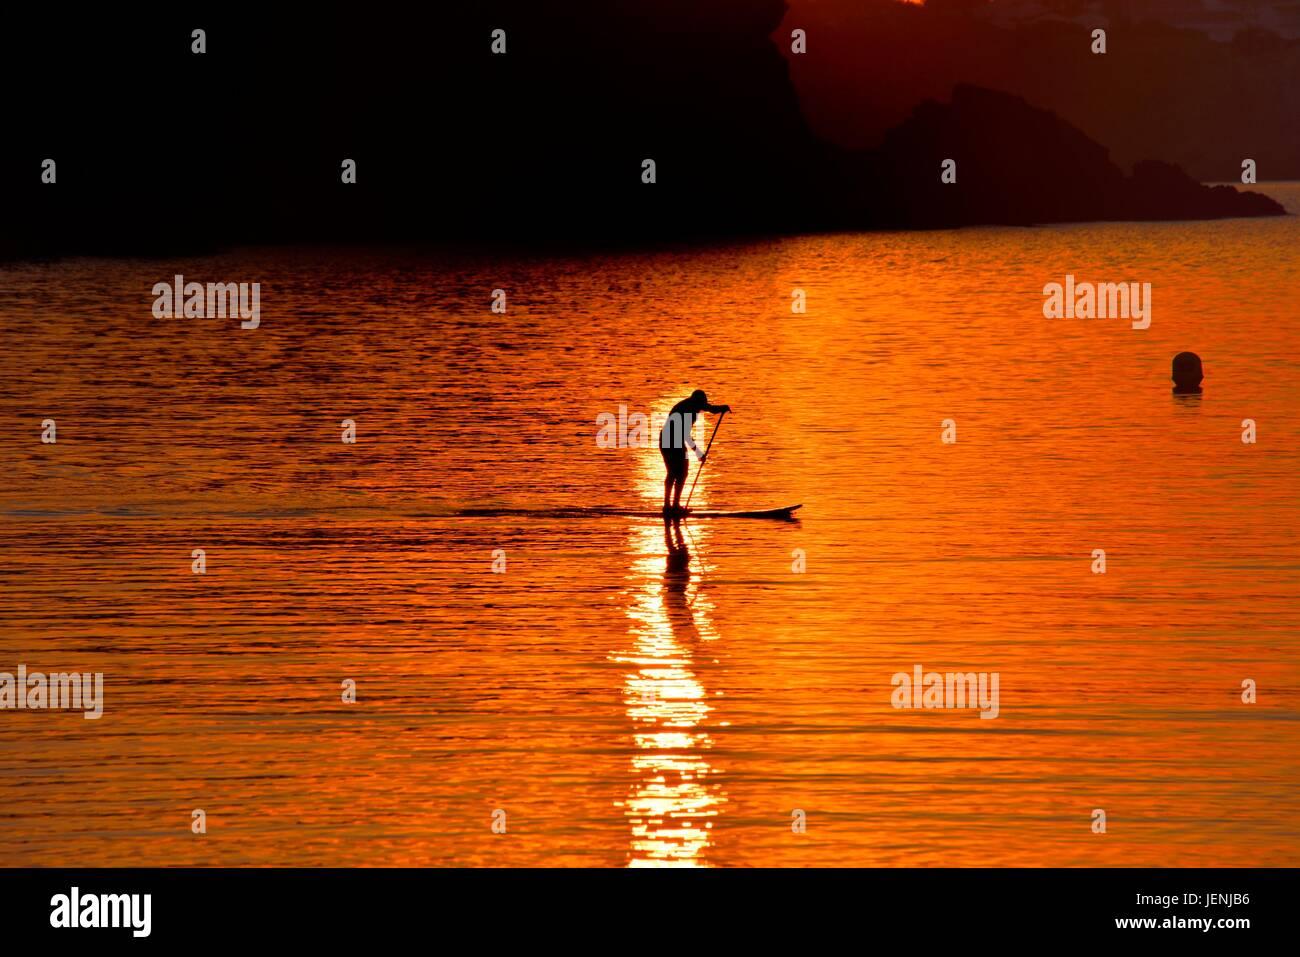 paddle-boarding-JENJB6.jpg